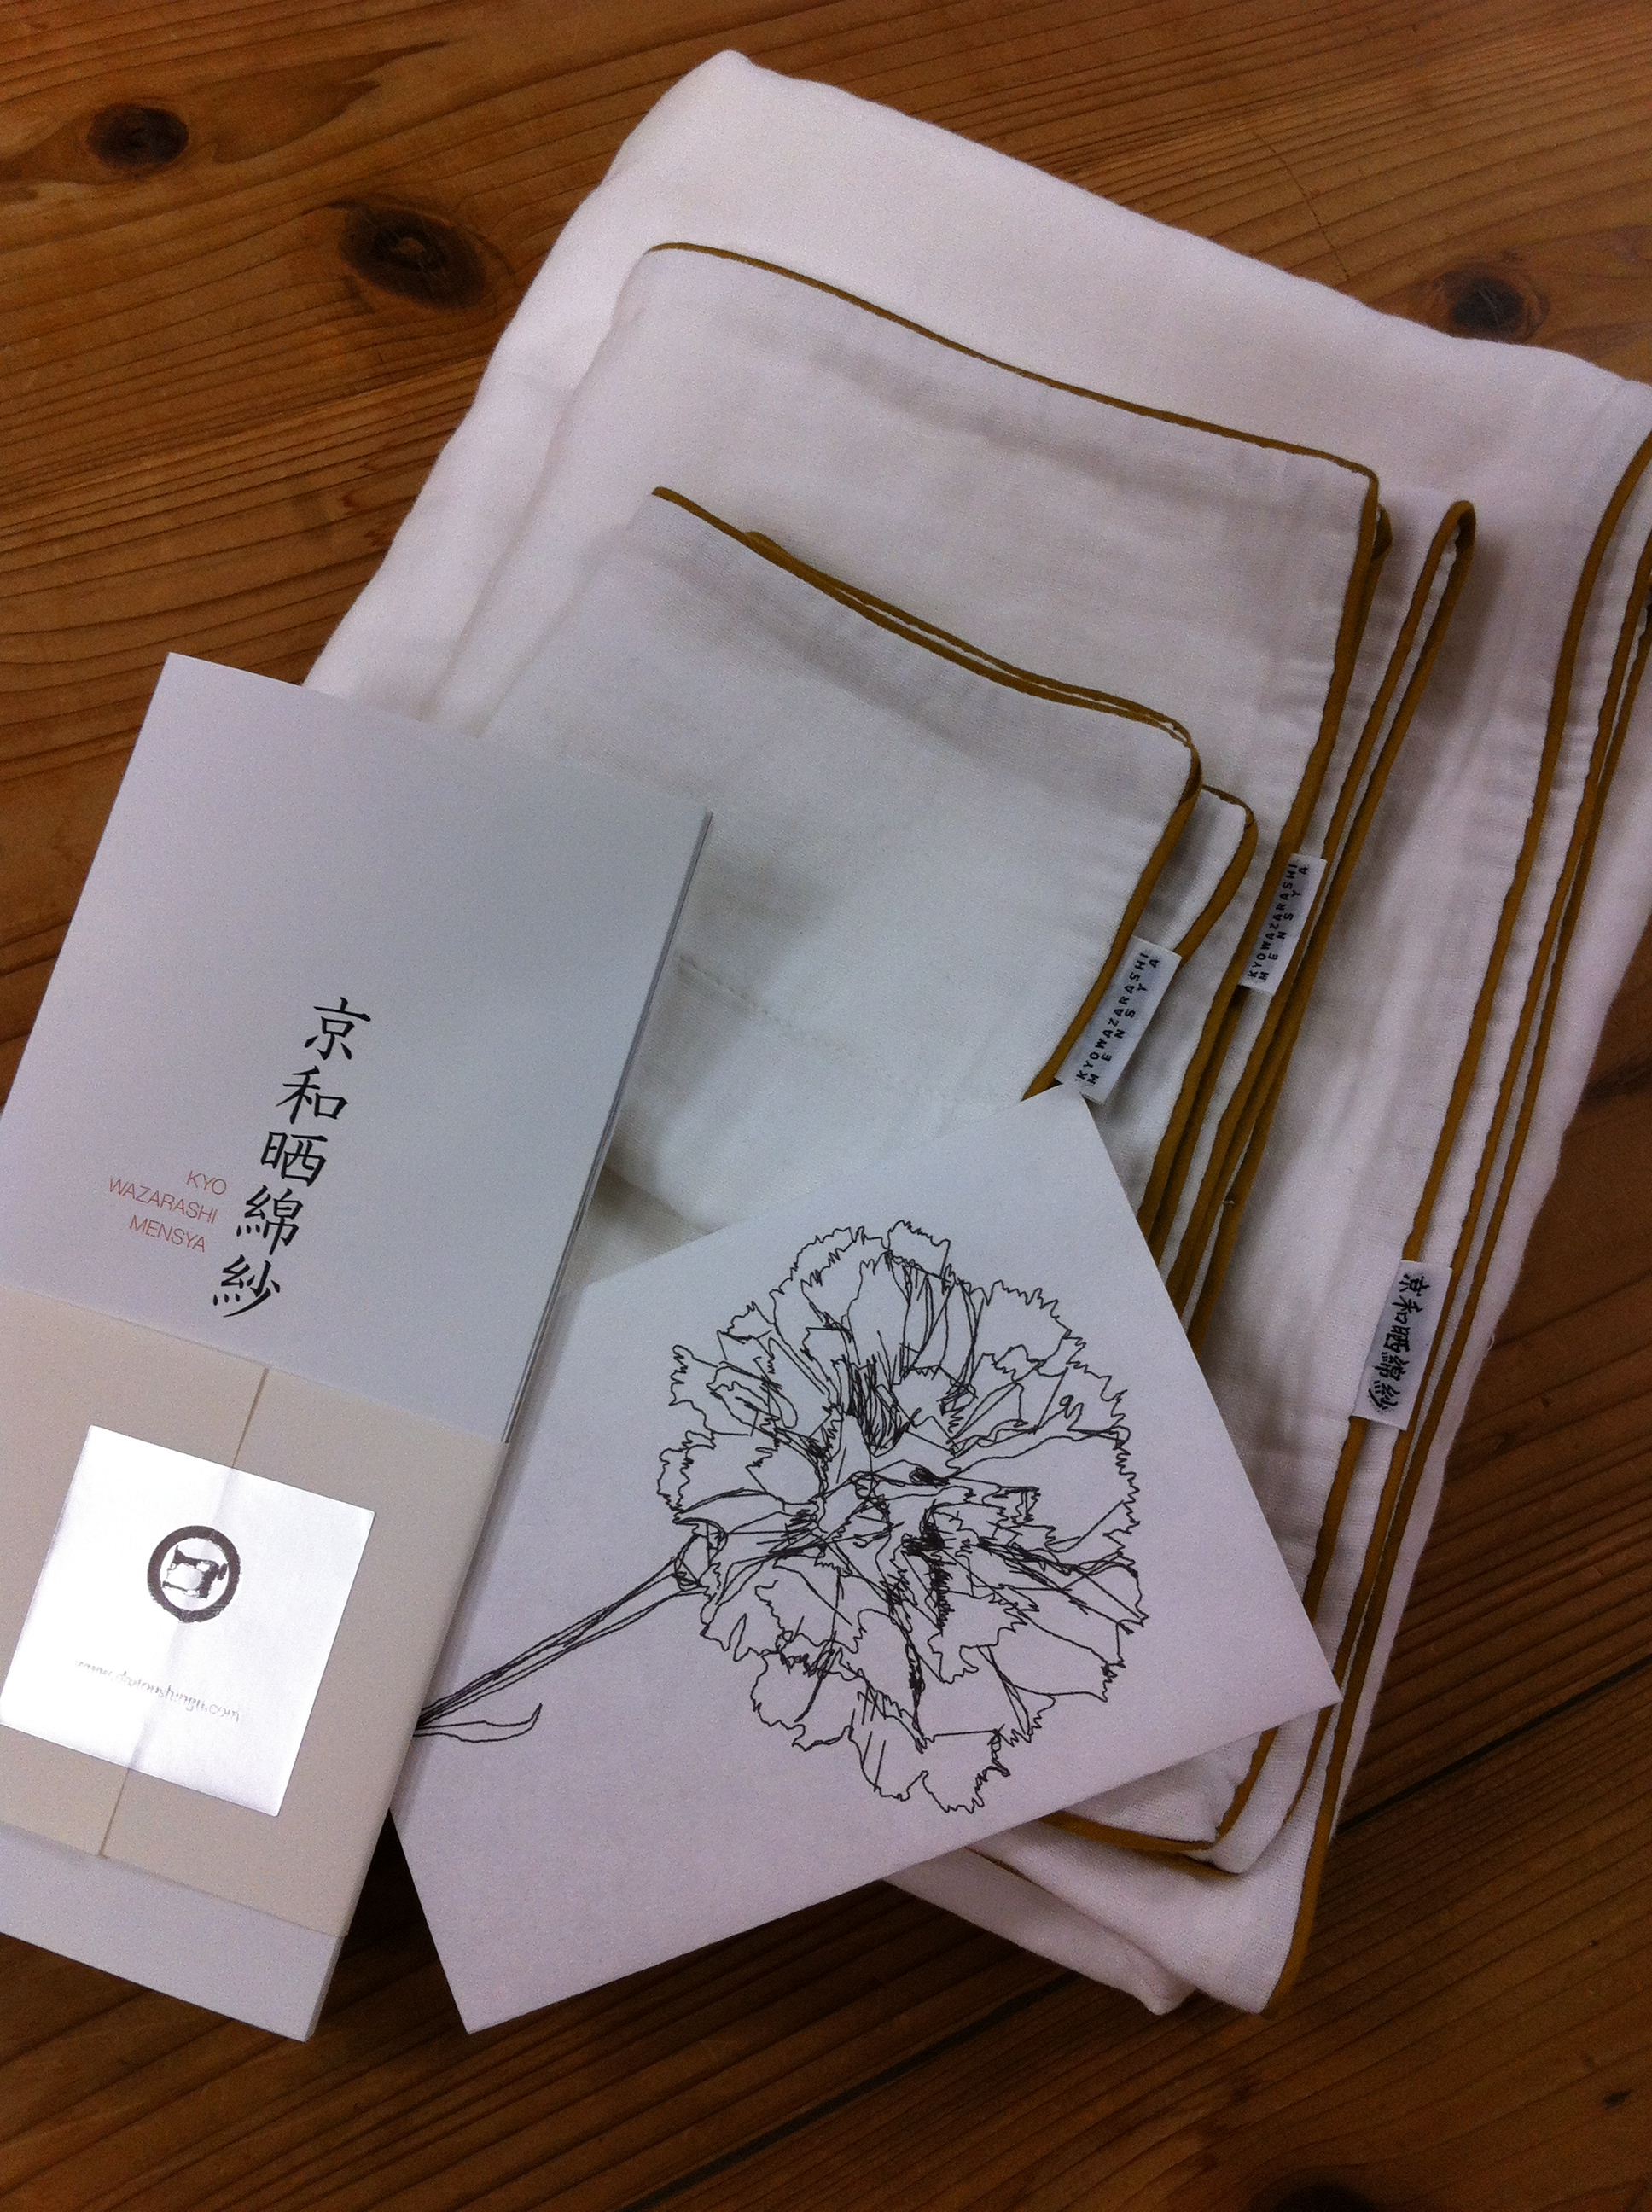 http://www.daitoushingu.com/info/images/IMG_1564.JPG